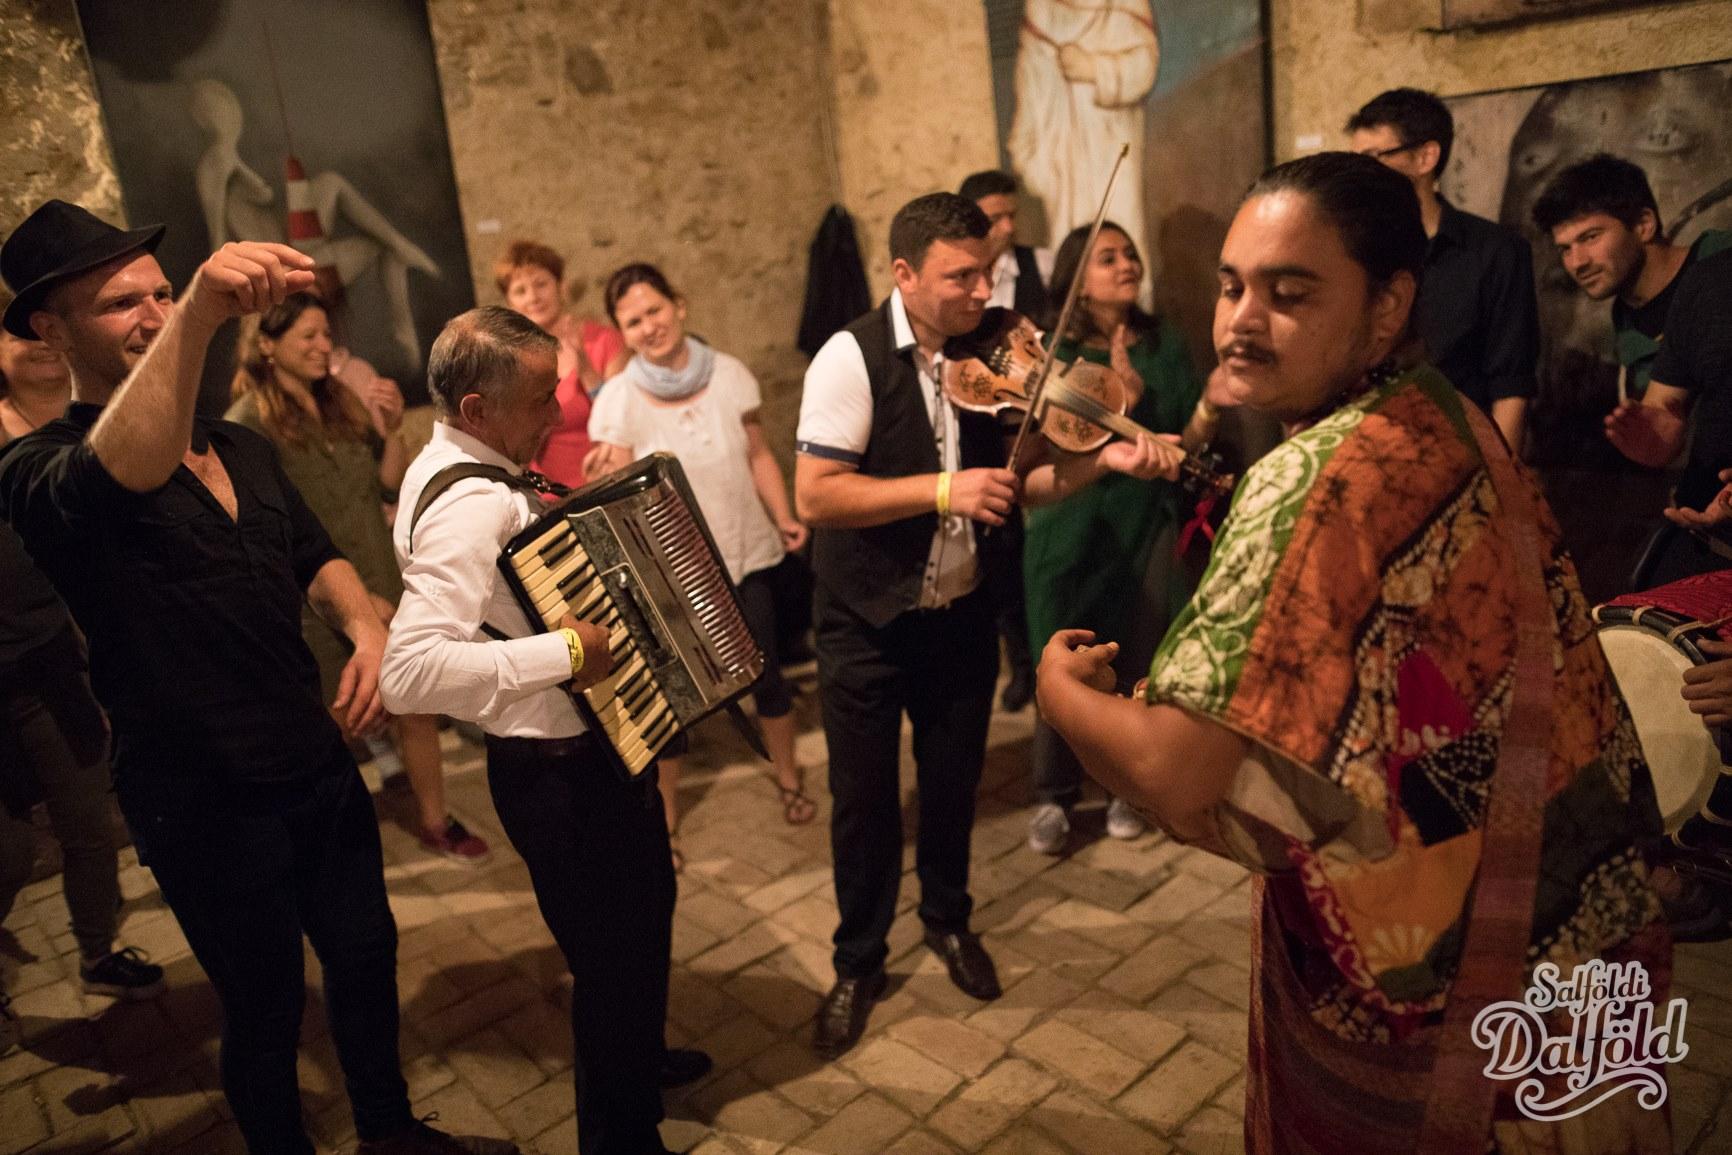 Salföldi Dalföld Music Festival, Hungary, July 7-8, 2018